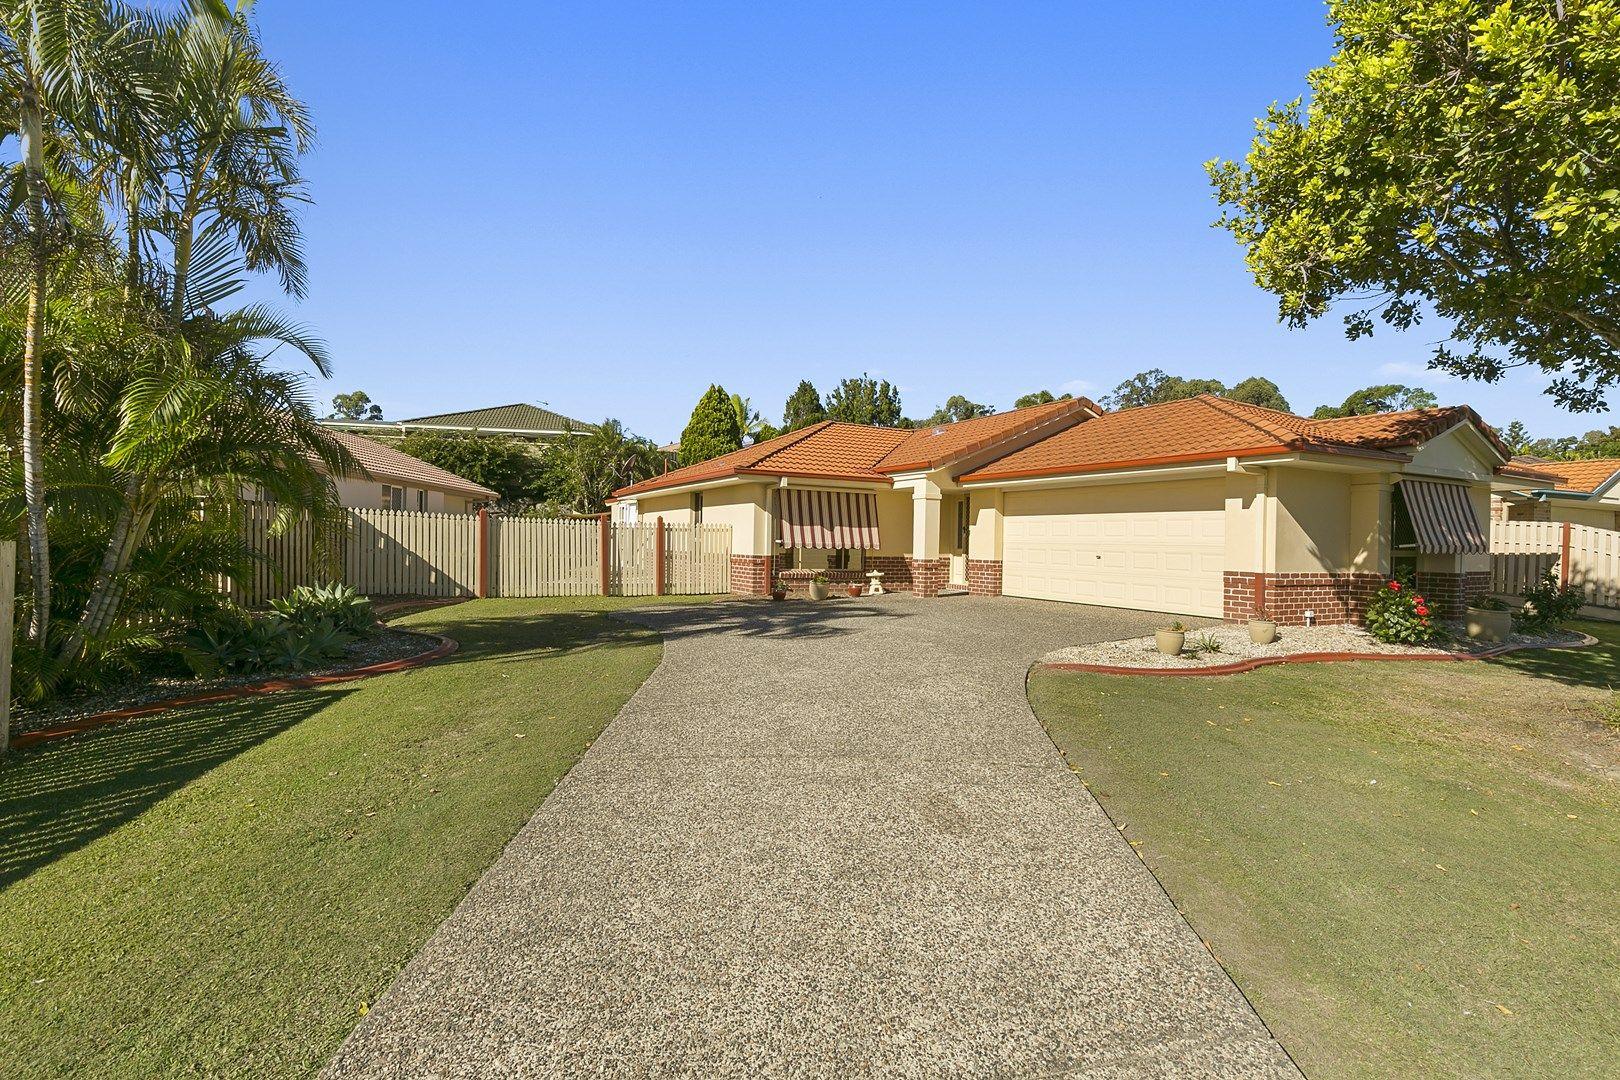 19 Lambor Drive, Mudgeeraba QLD 4213, Image 0